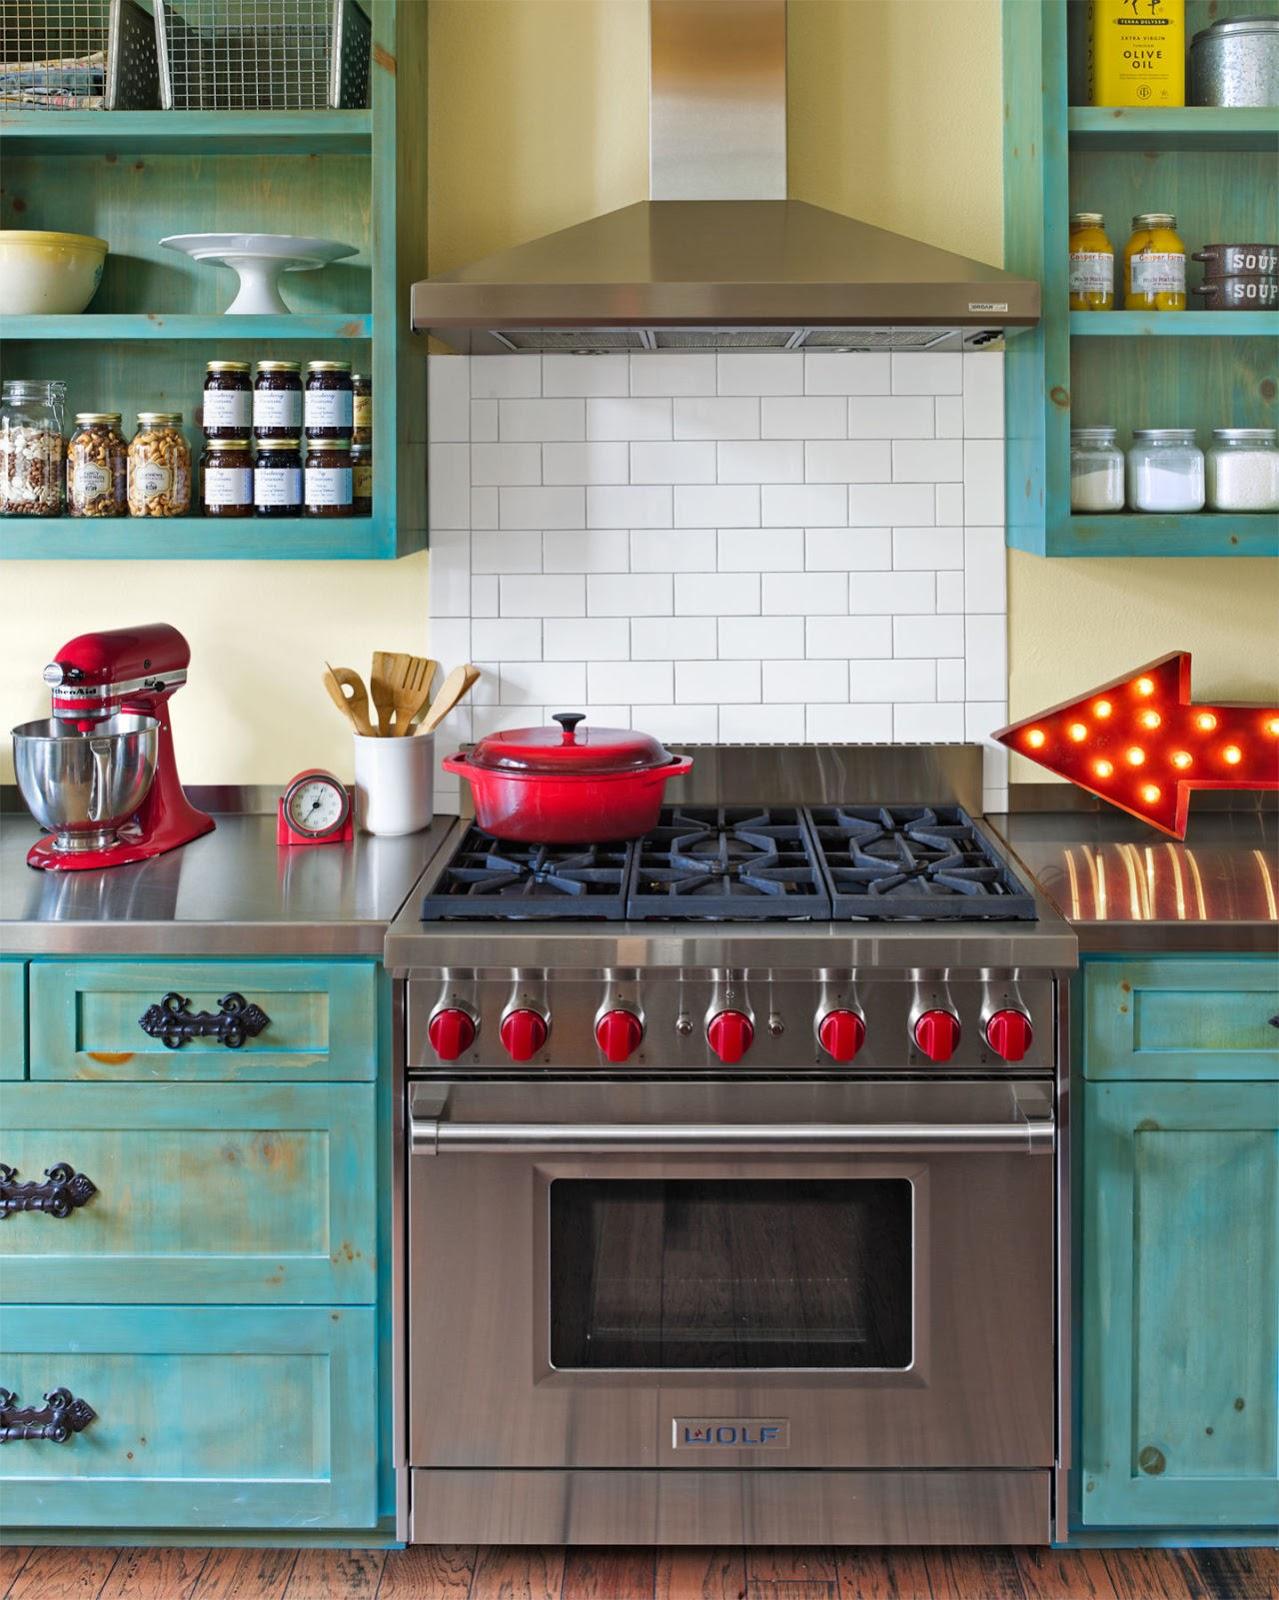 Decor Inspiration /// Colorful Kitchens That Work | Design ...